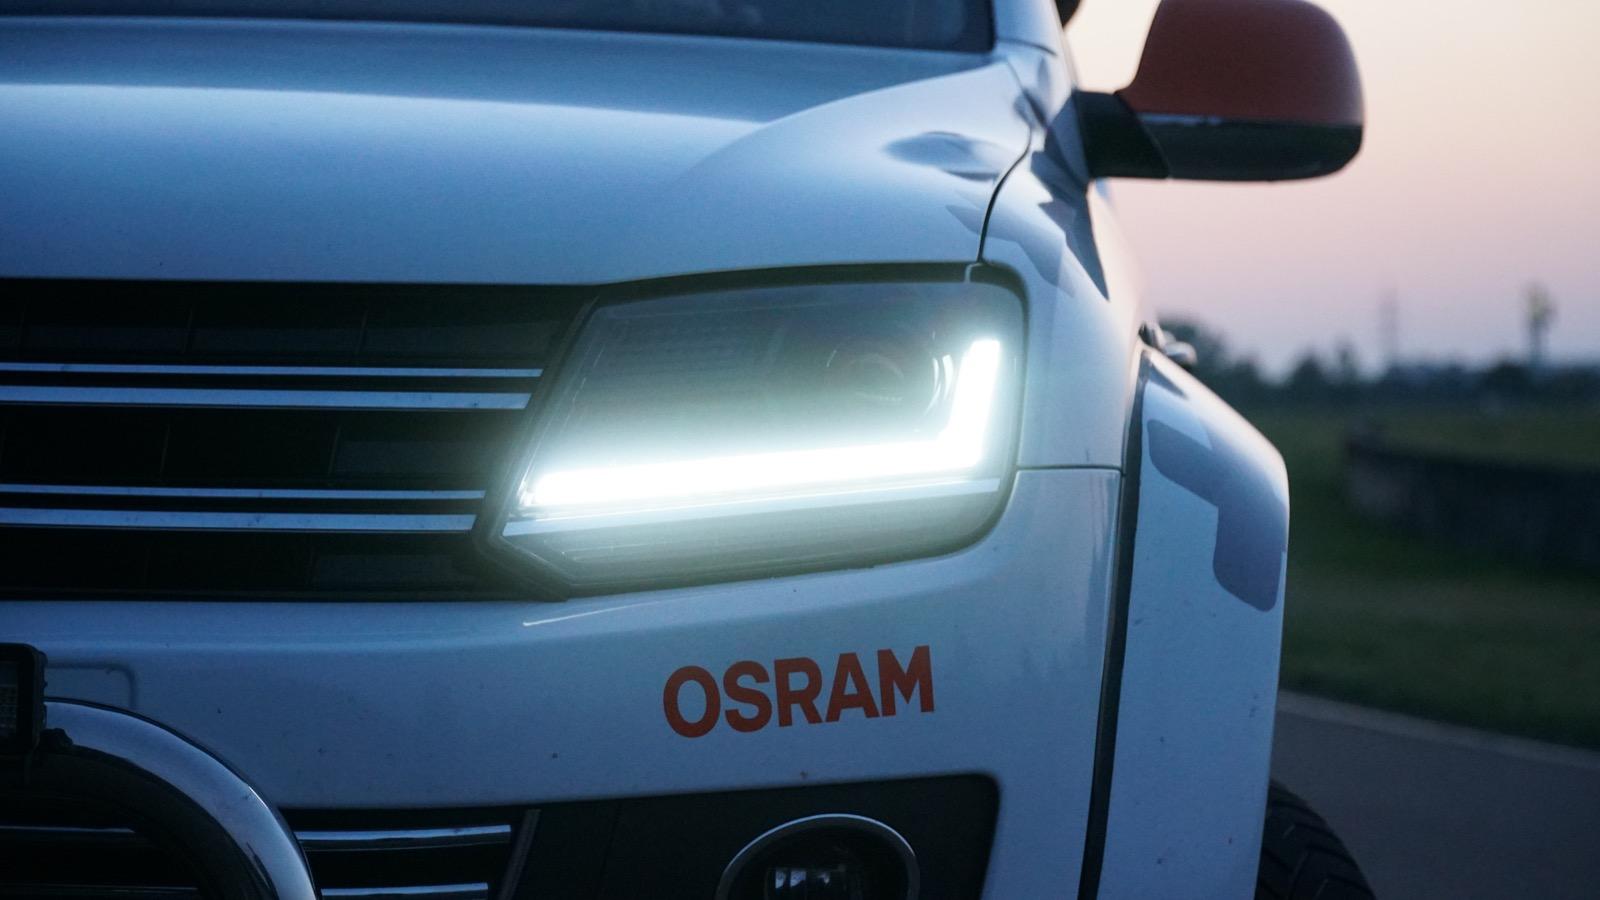 Osram LEDriving LED-Scheinwerfer für den VW Amarok